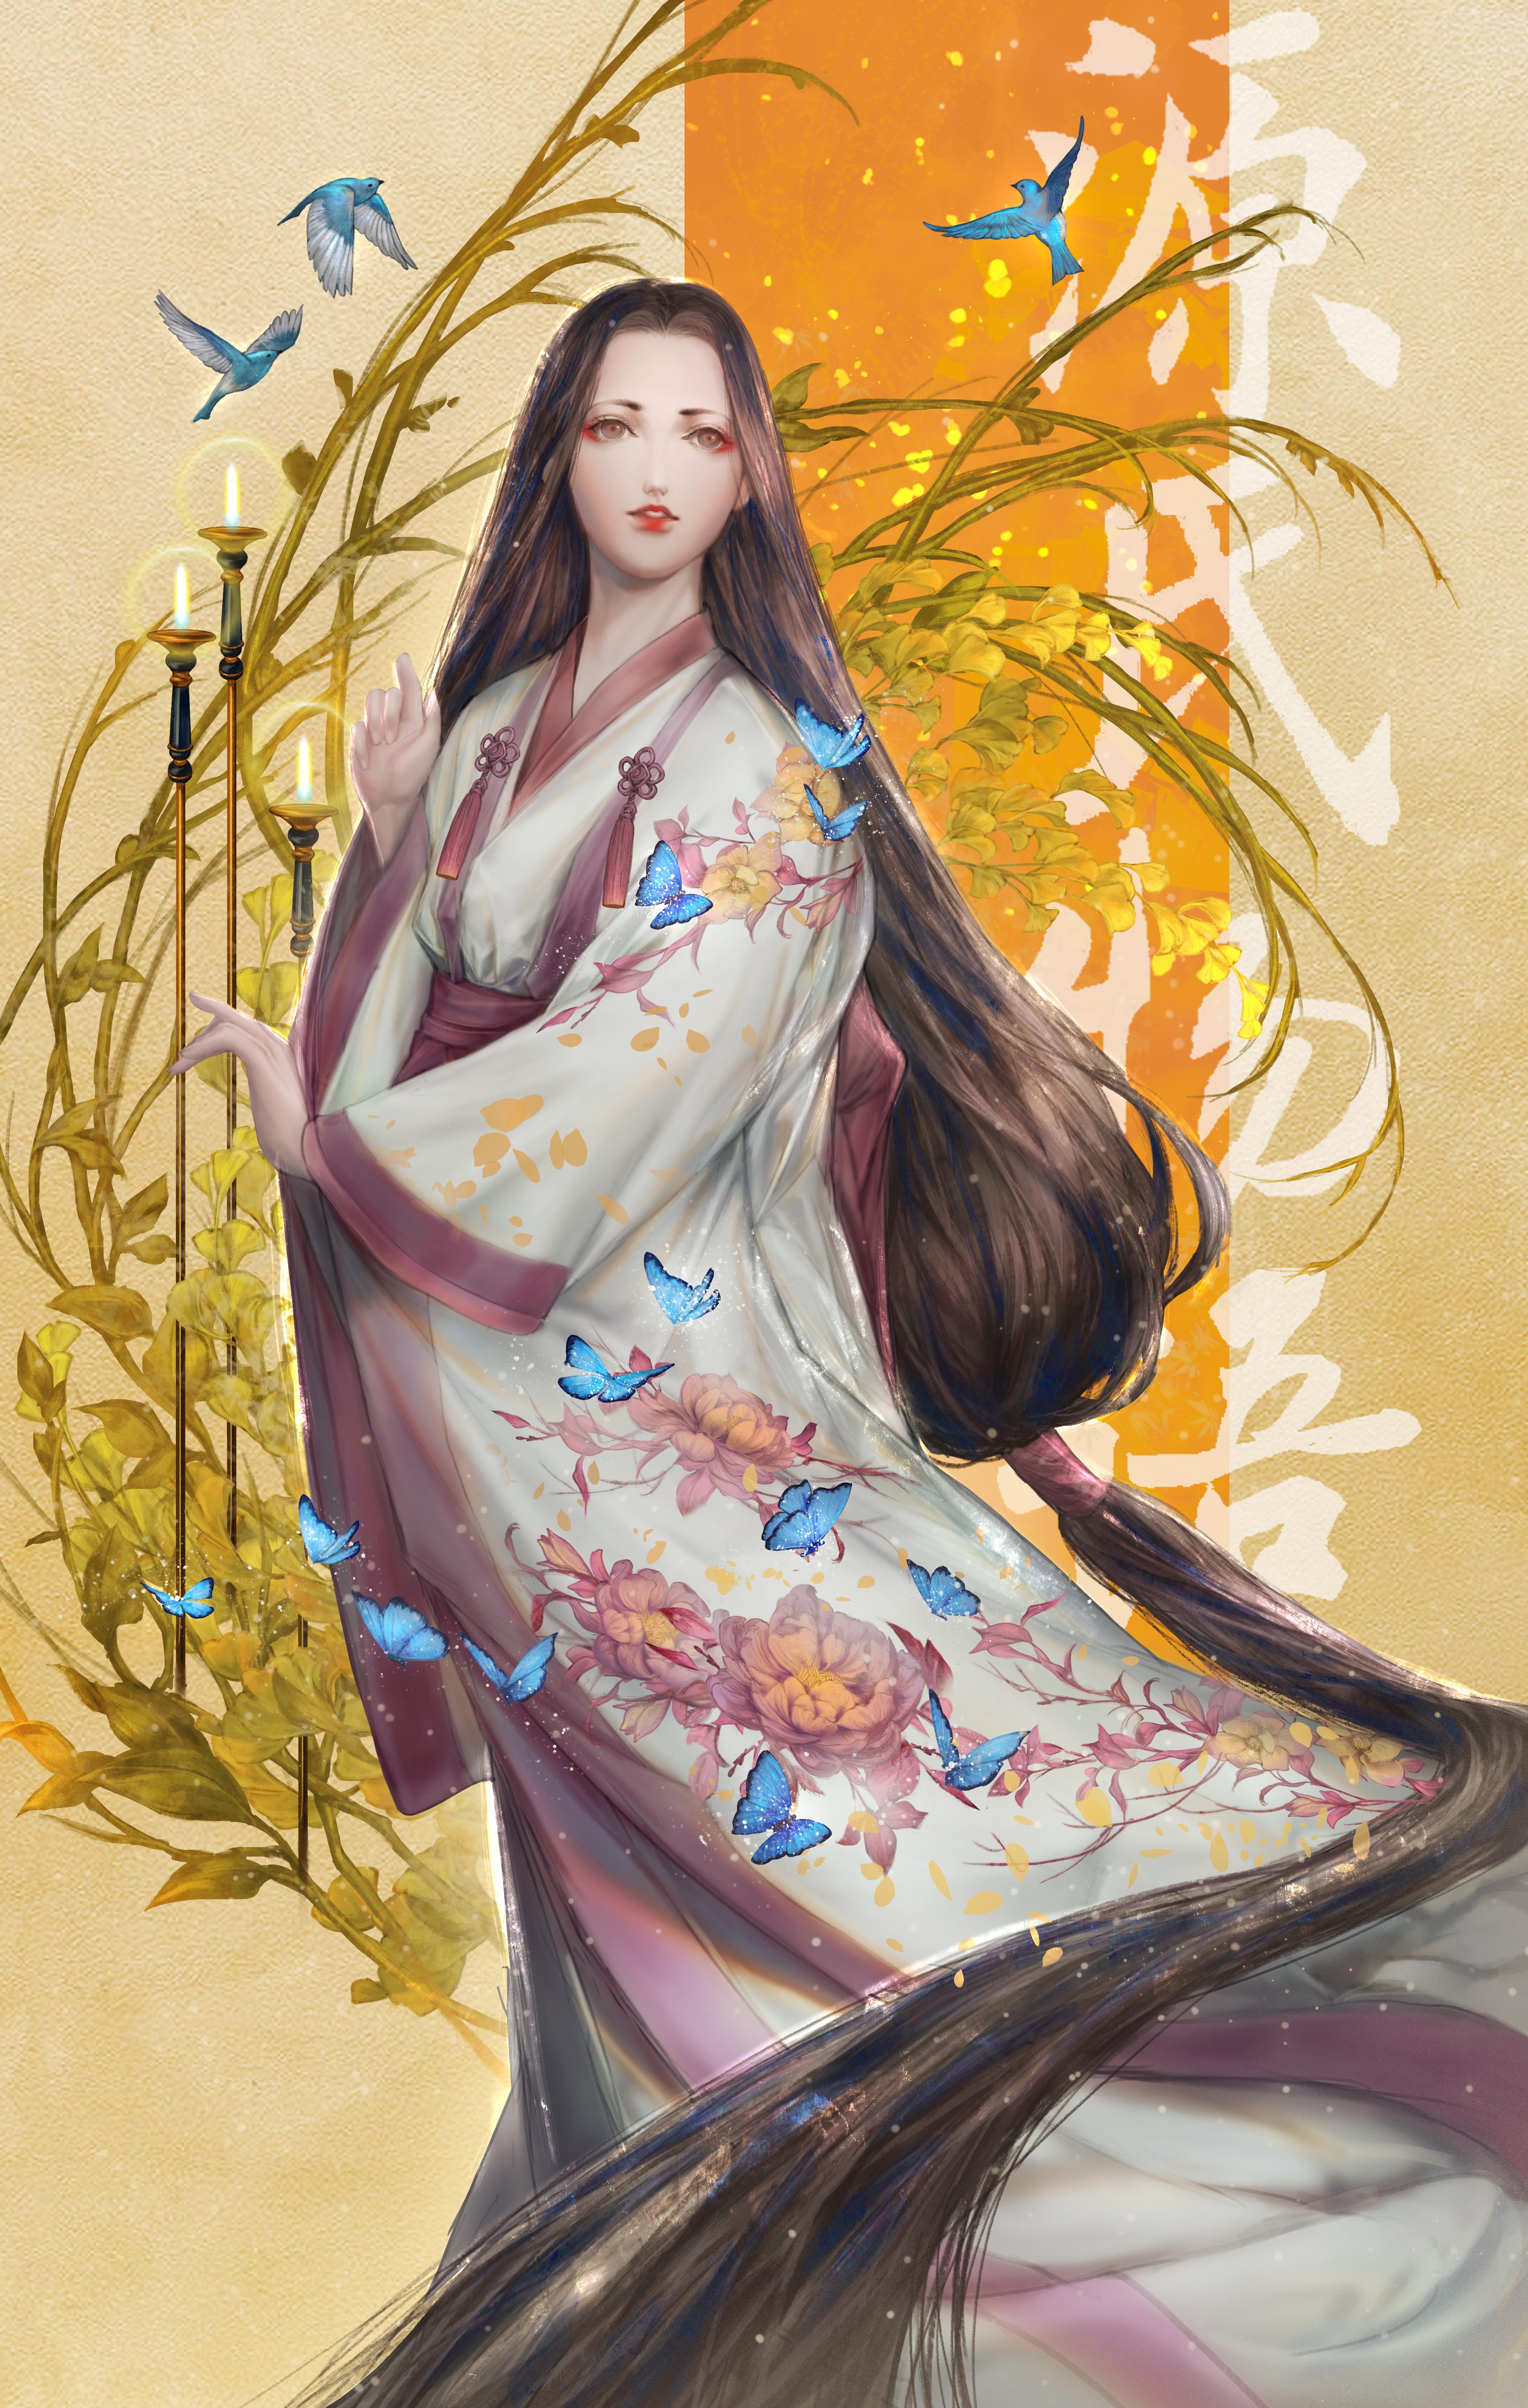 Genji Monotakari/Eden Chang